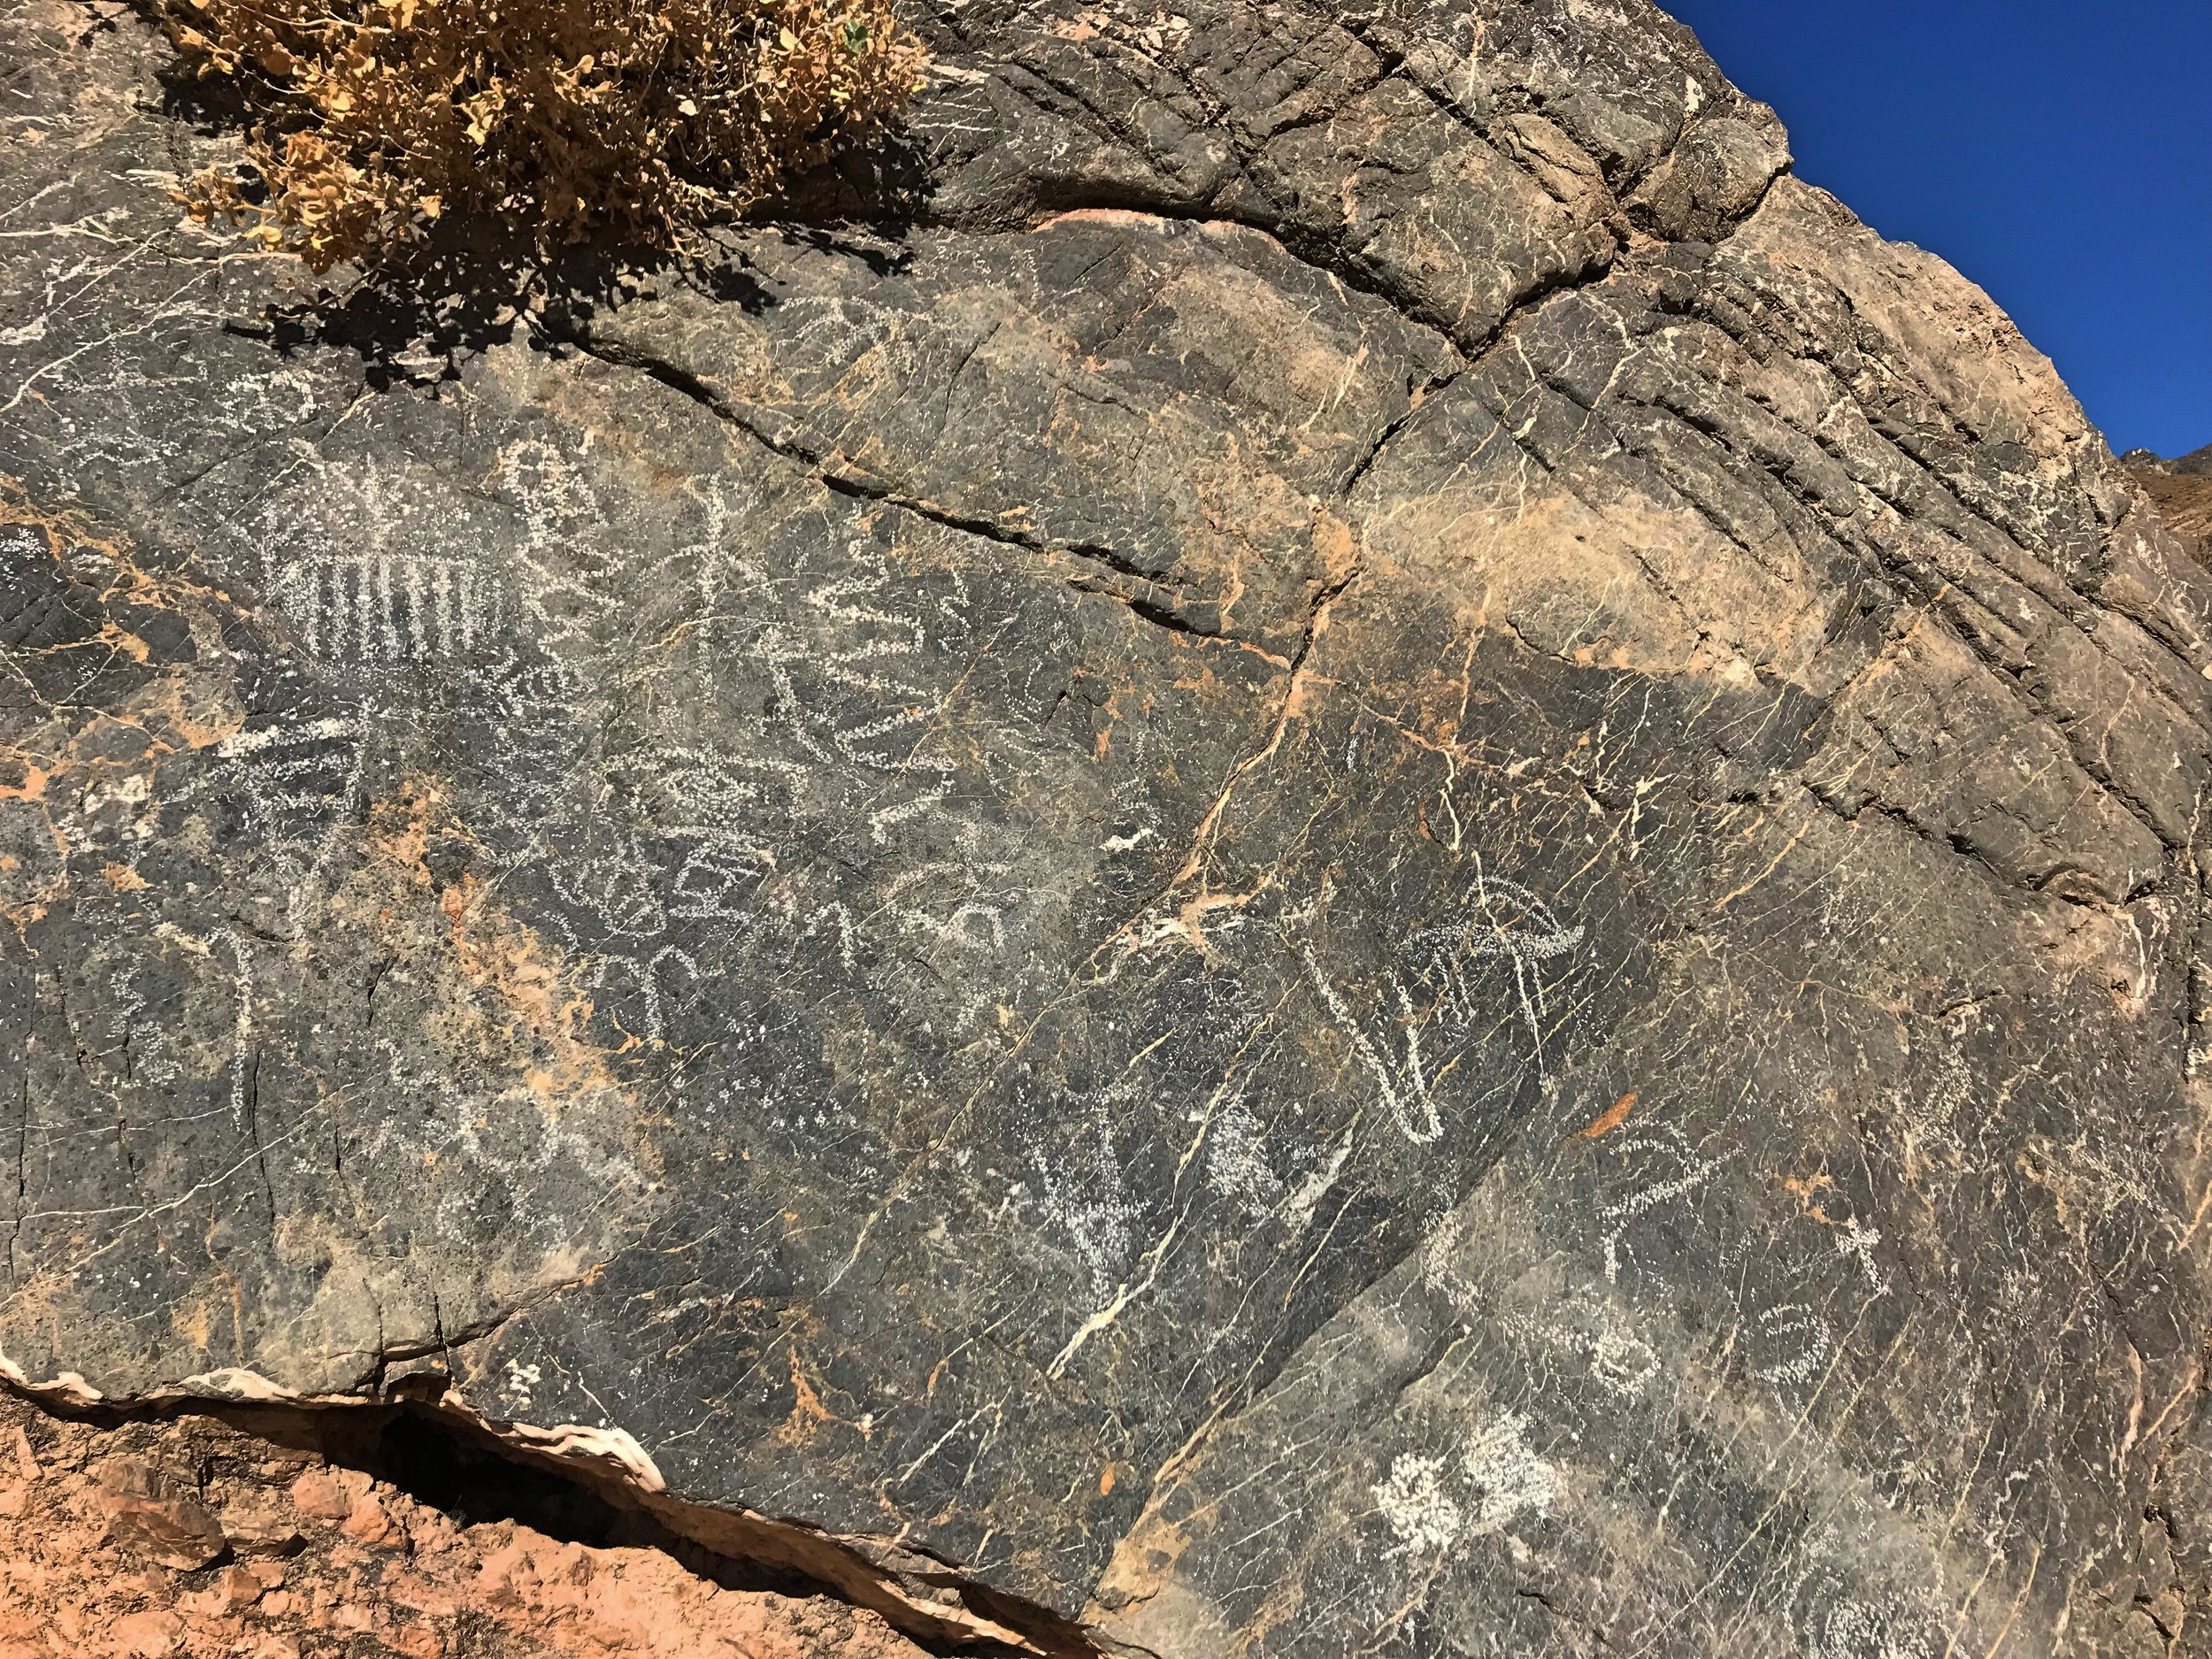 The ancient petroglyphs at Klare Spring.